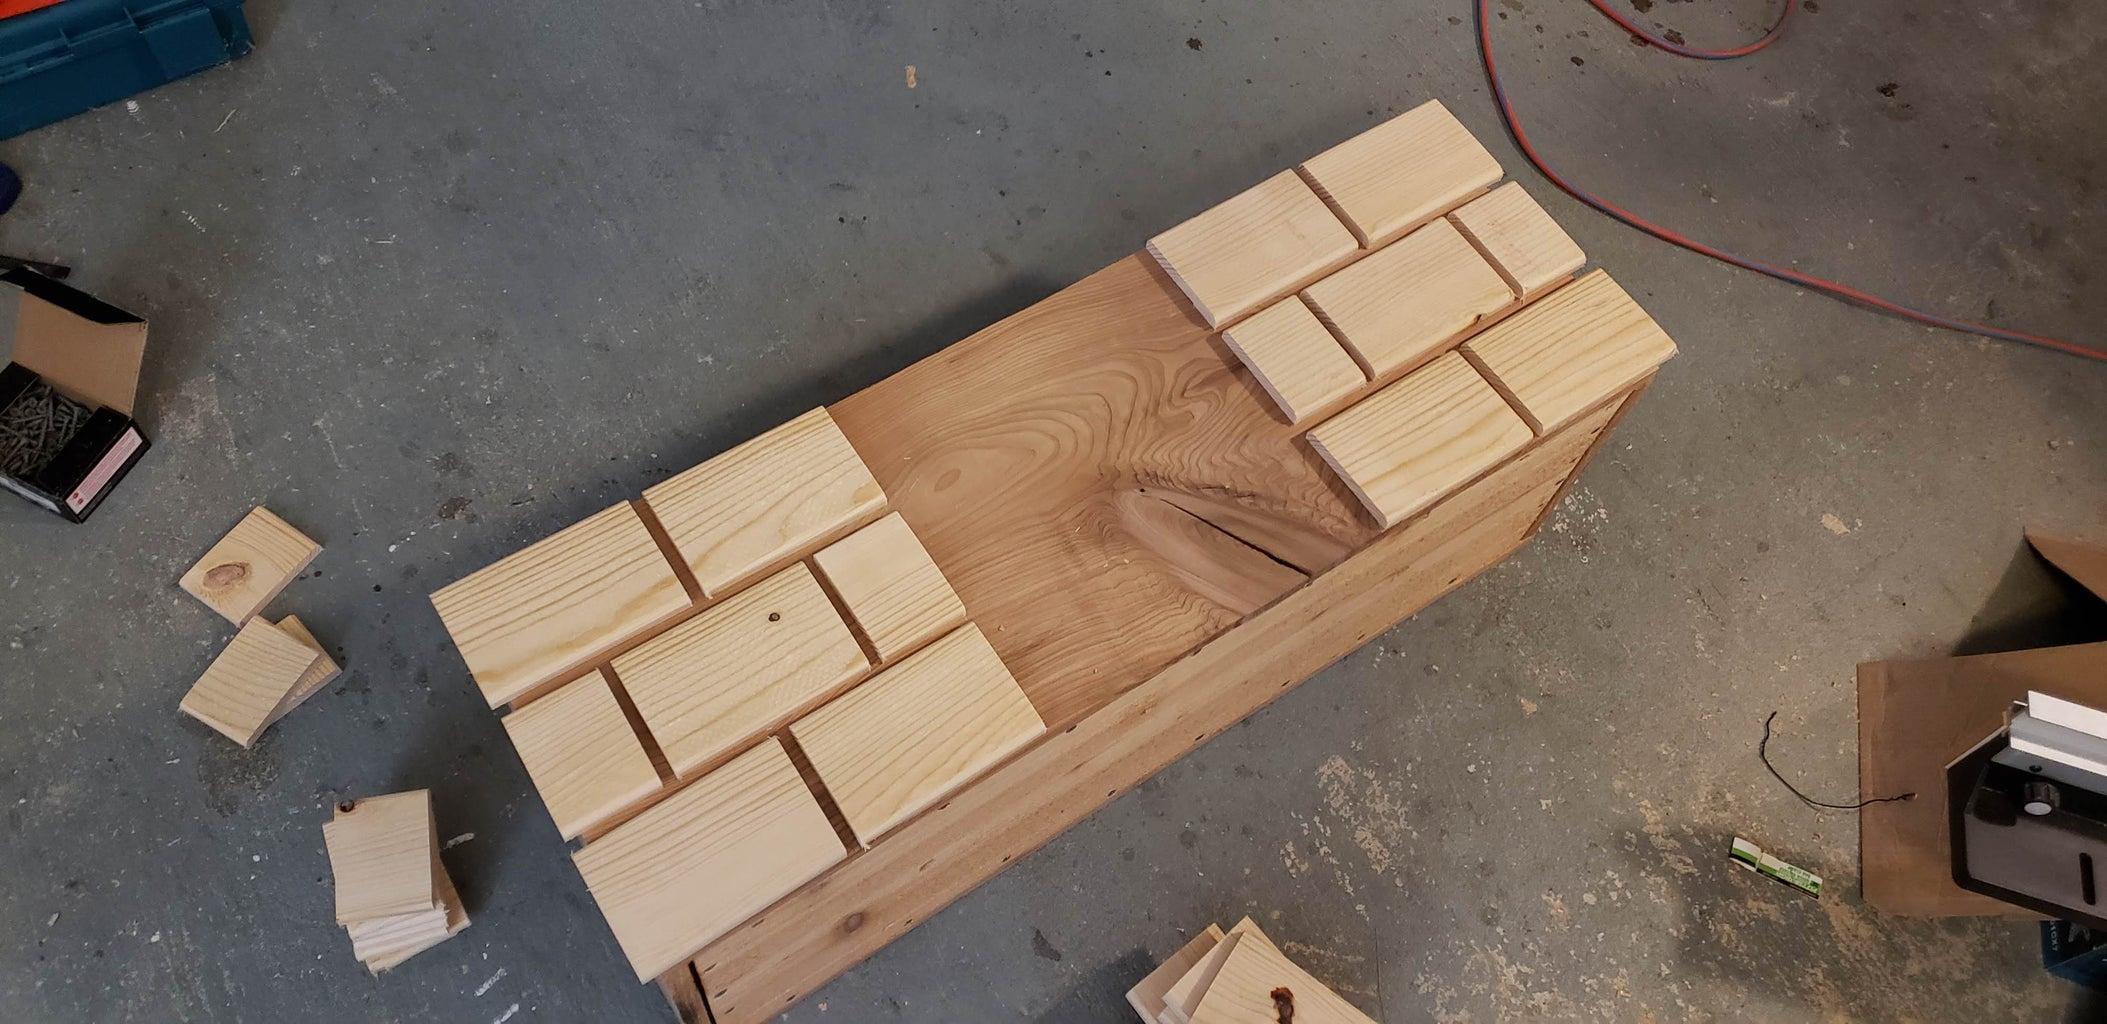 Cutting the Bricks